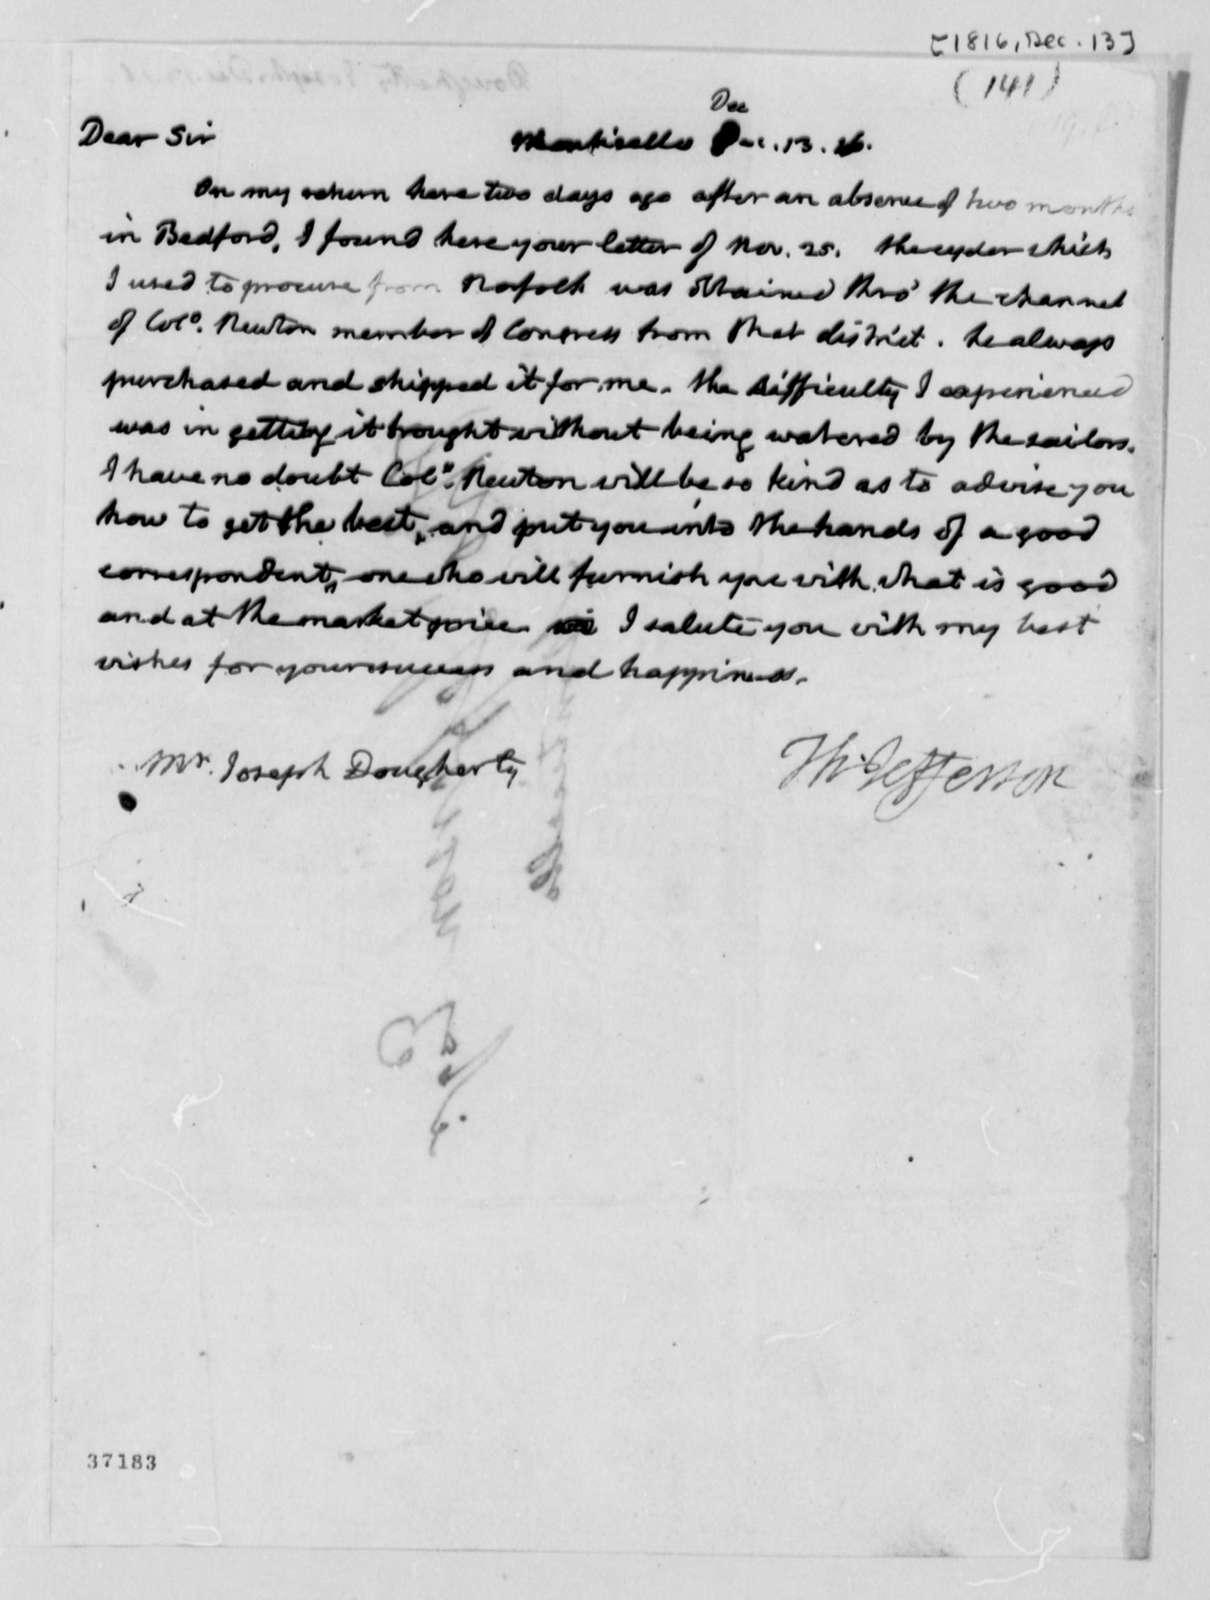 Thomas Jefferson to Joseph Dougherty, December 13, 1816